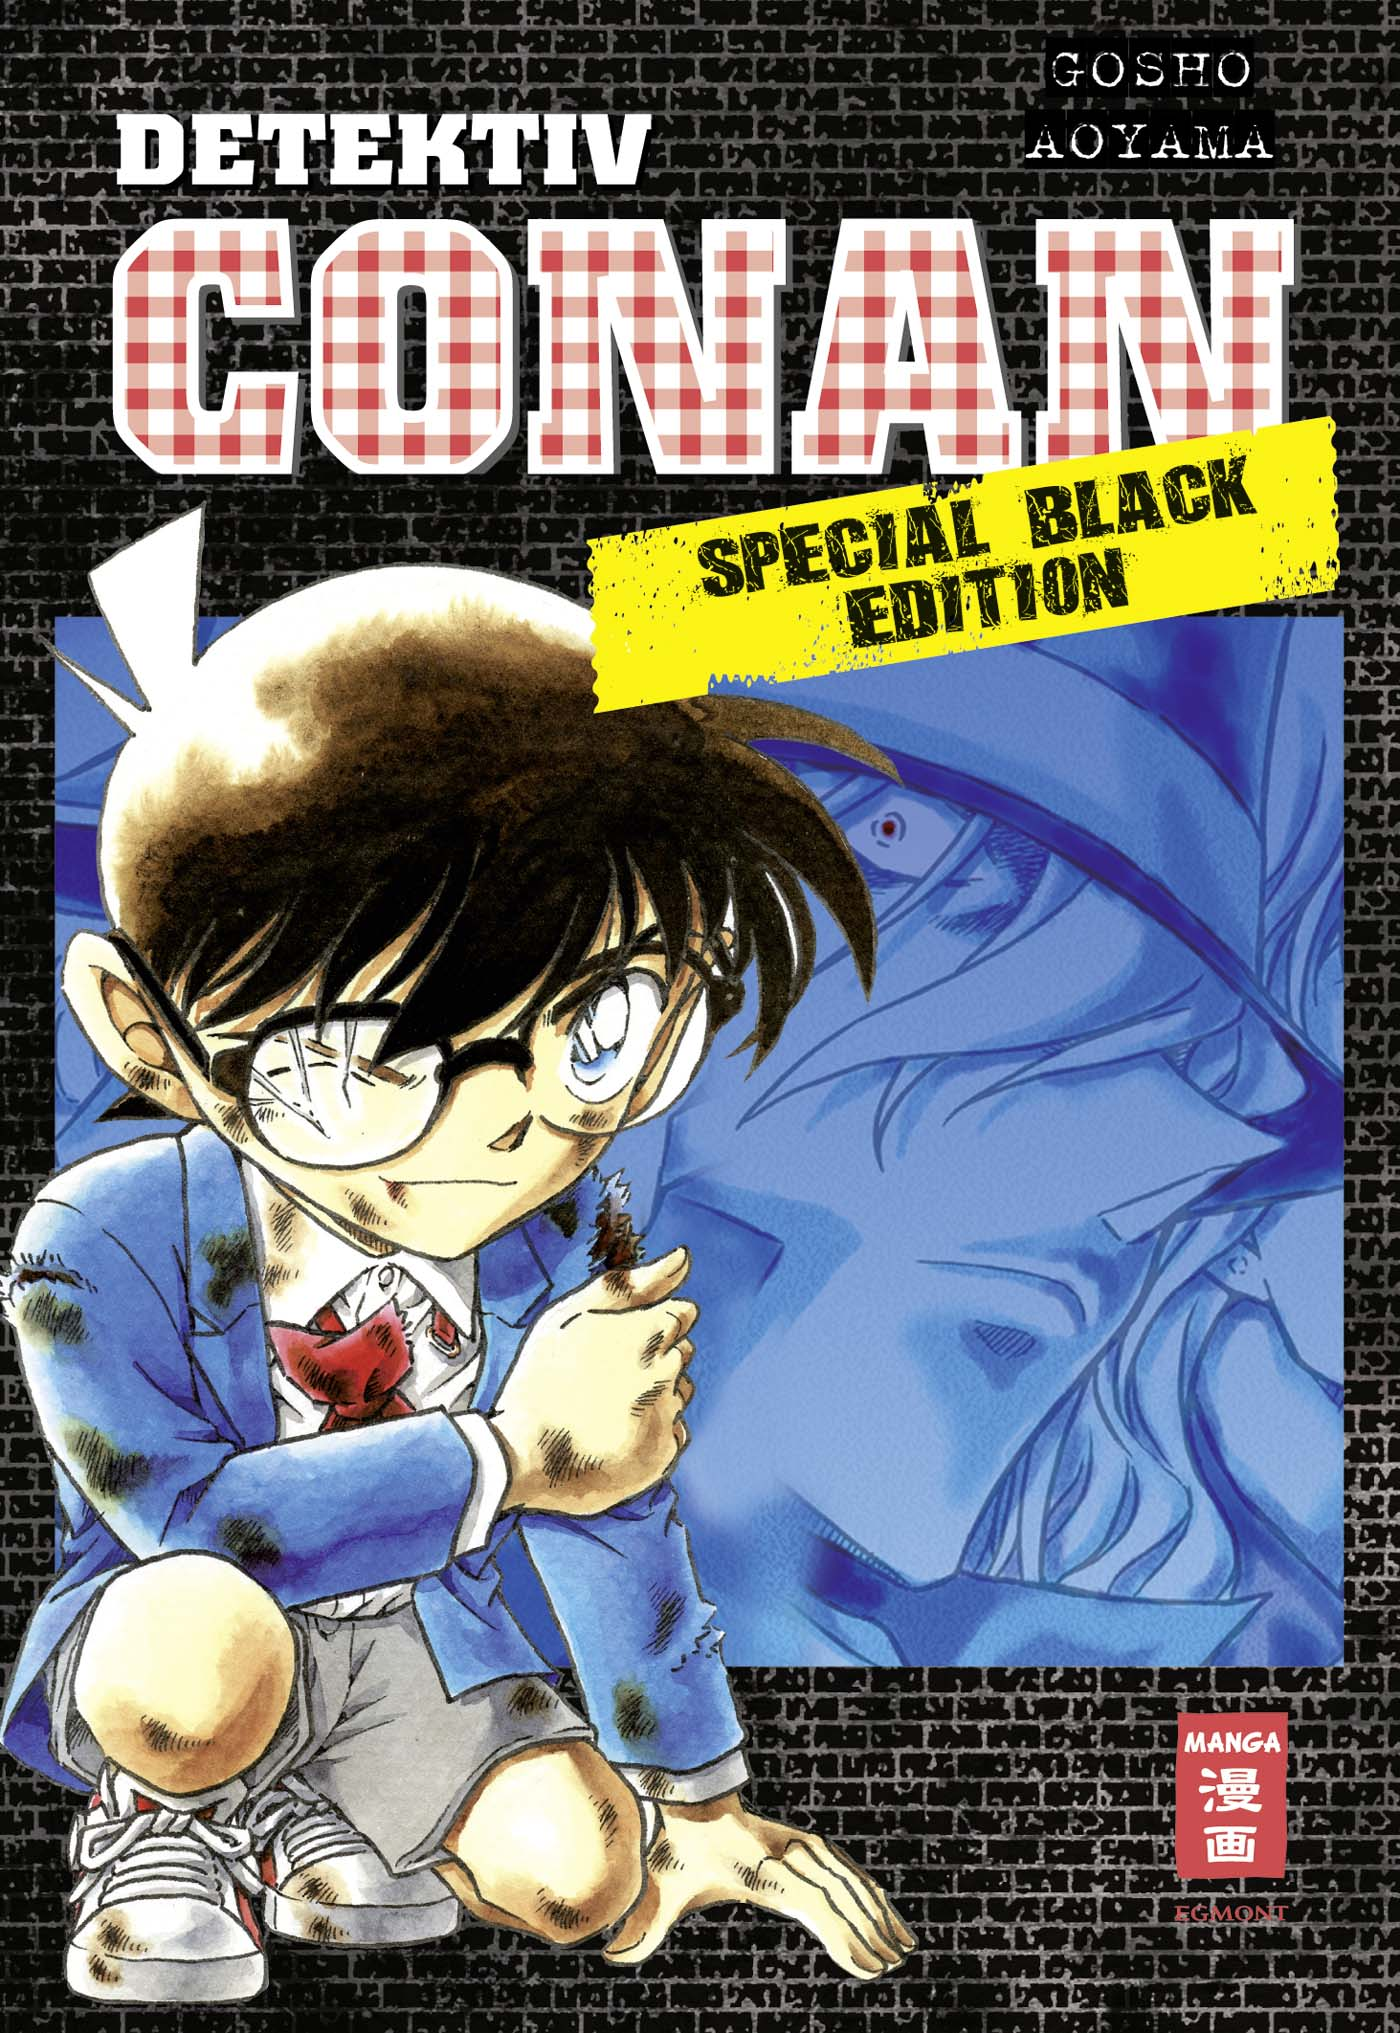 Detektiv Conan Special Black Edition - Gosho Aoyama